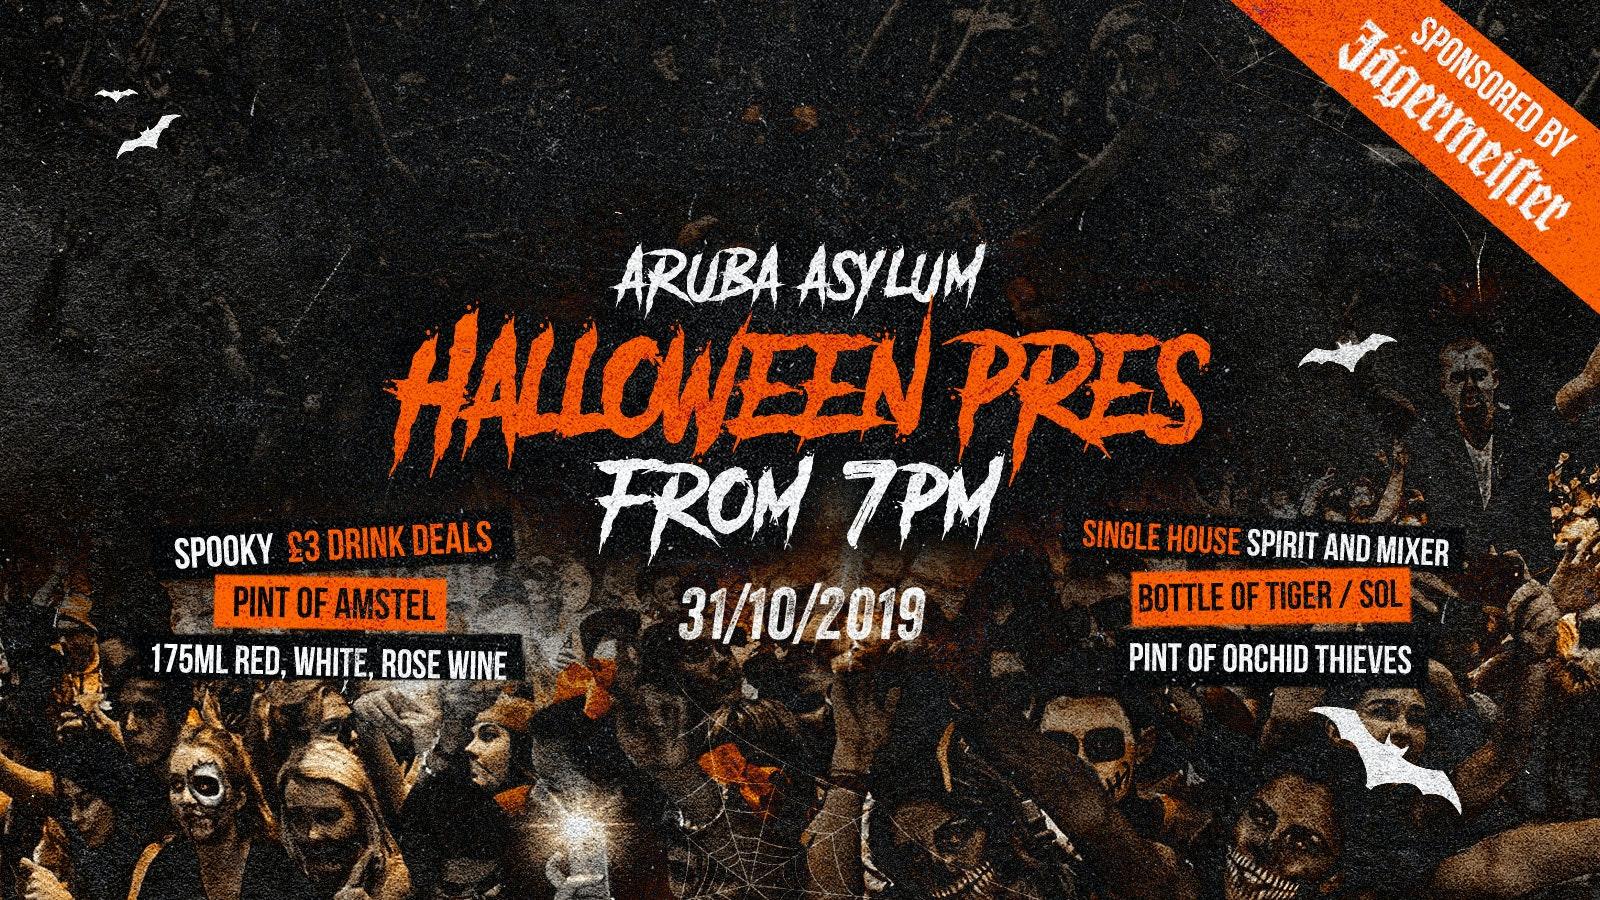 Aruba Asylum Halloween Pres at 7PM